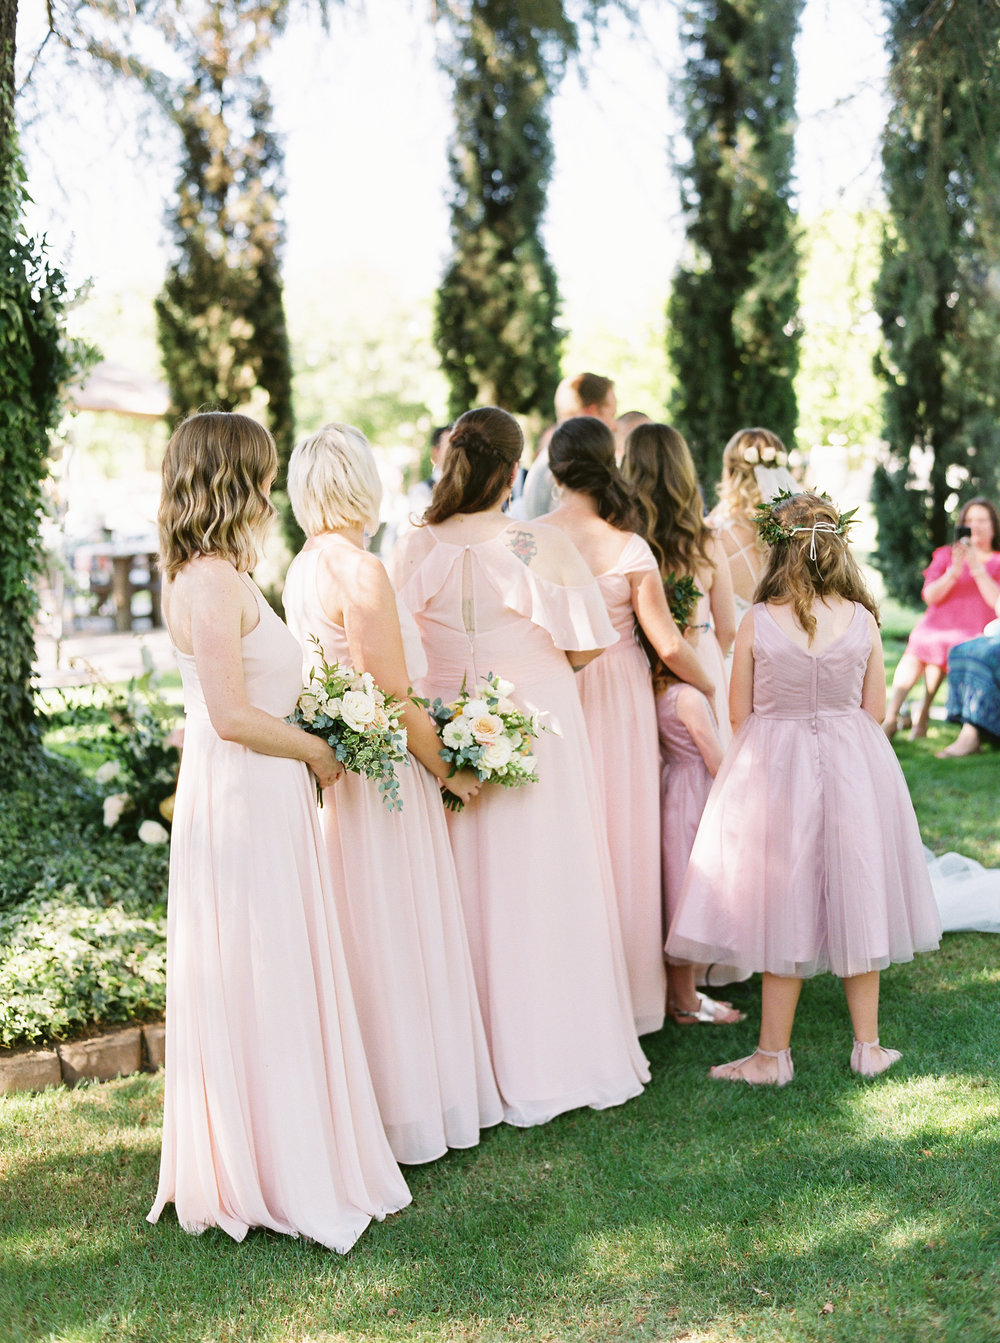 Durst-winery-wedding-in-lodi-calfornia-129.jpg